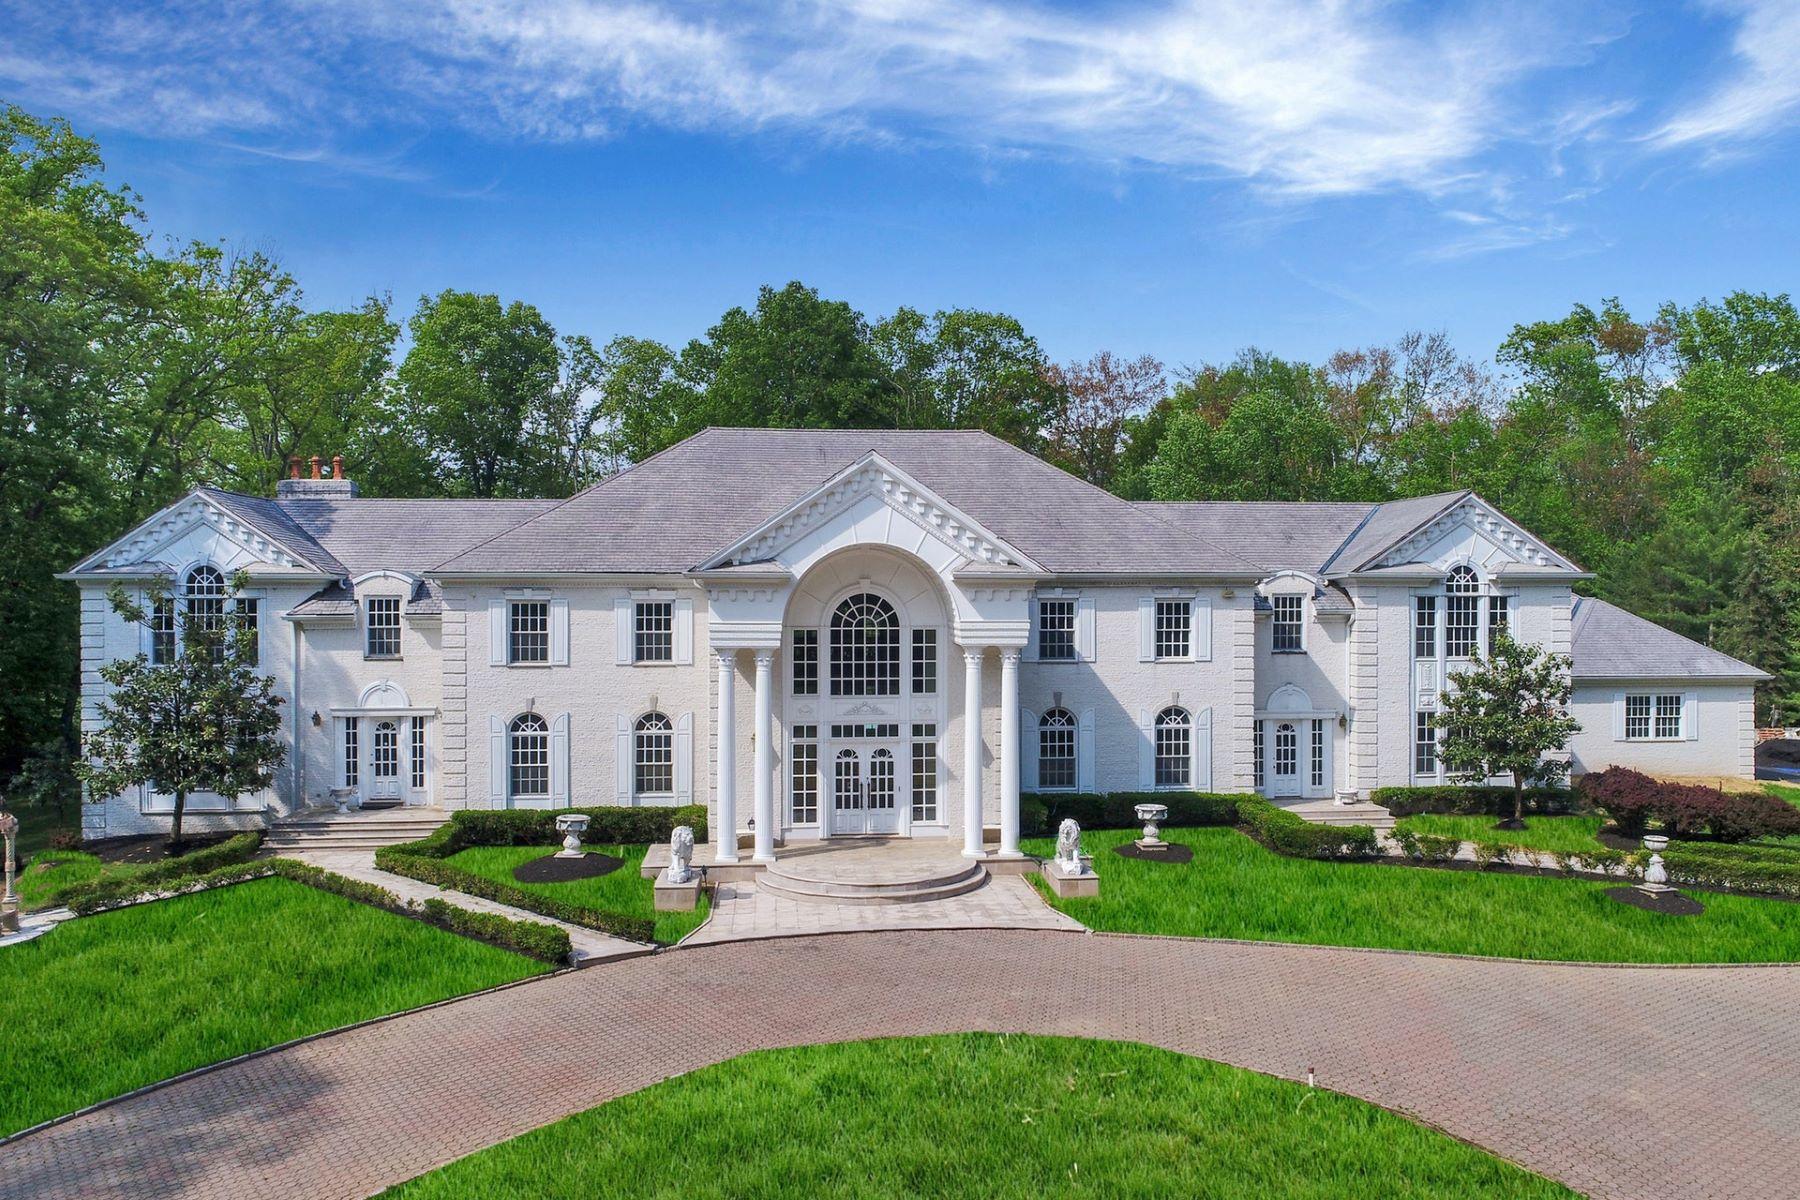 Частный односемейный дом для того Аренда на White House at Livingston 325 South Orange Avenue, Livingston, Нью-Джерси 07039 Соединенные Штаты